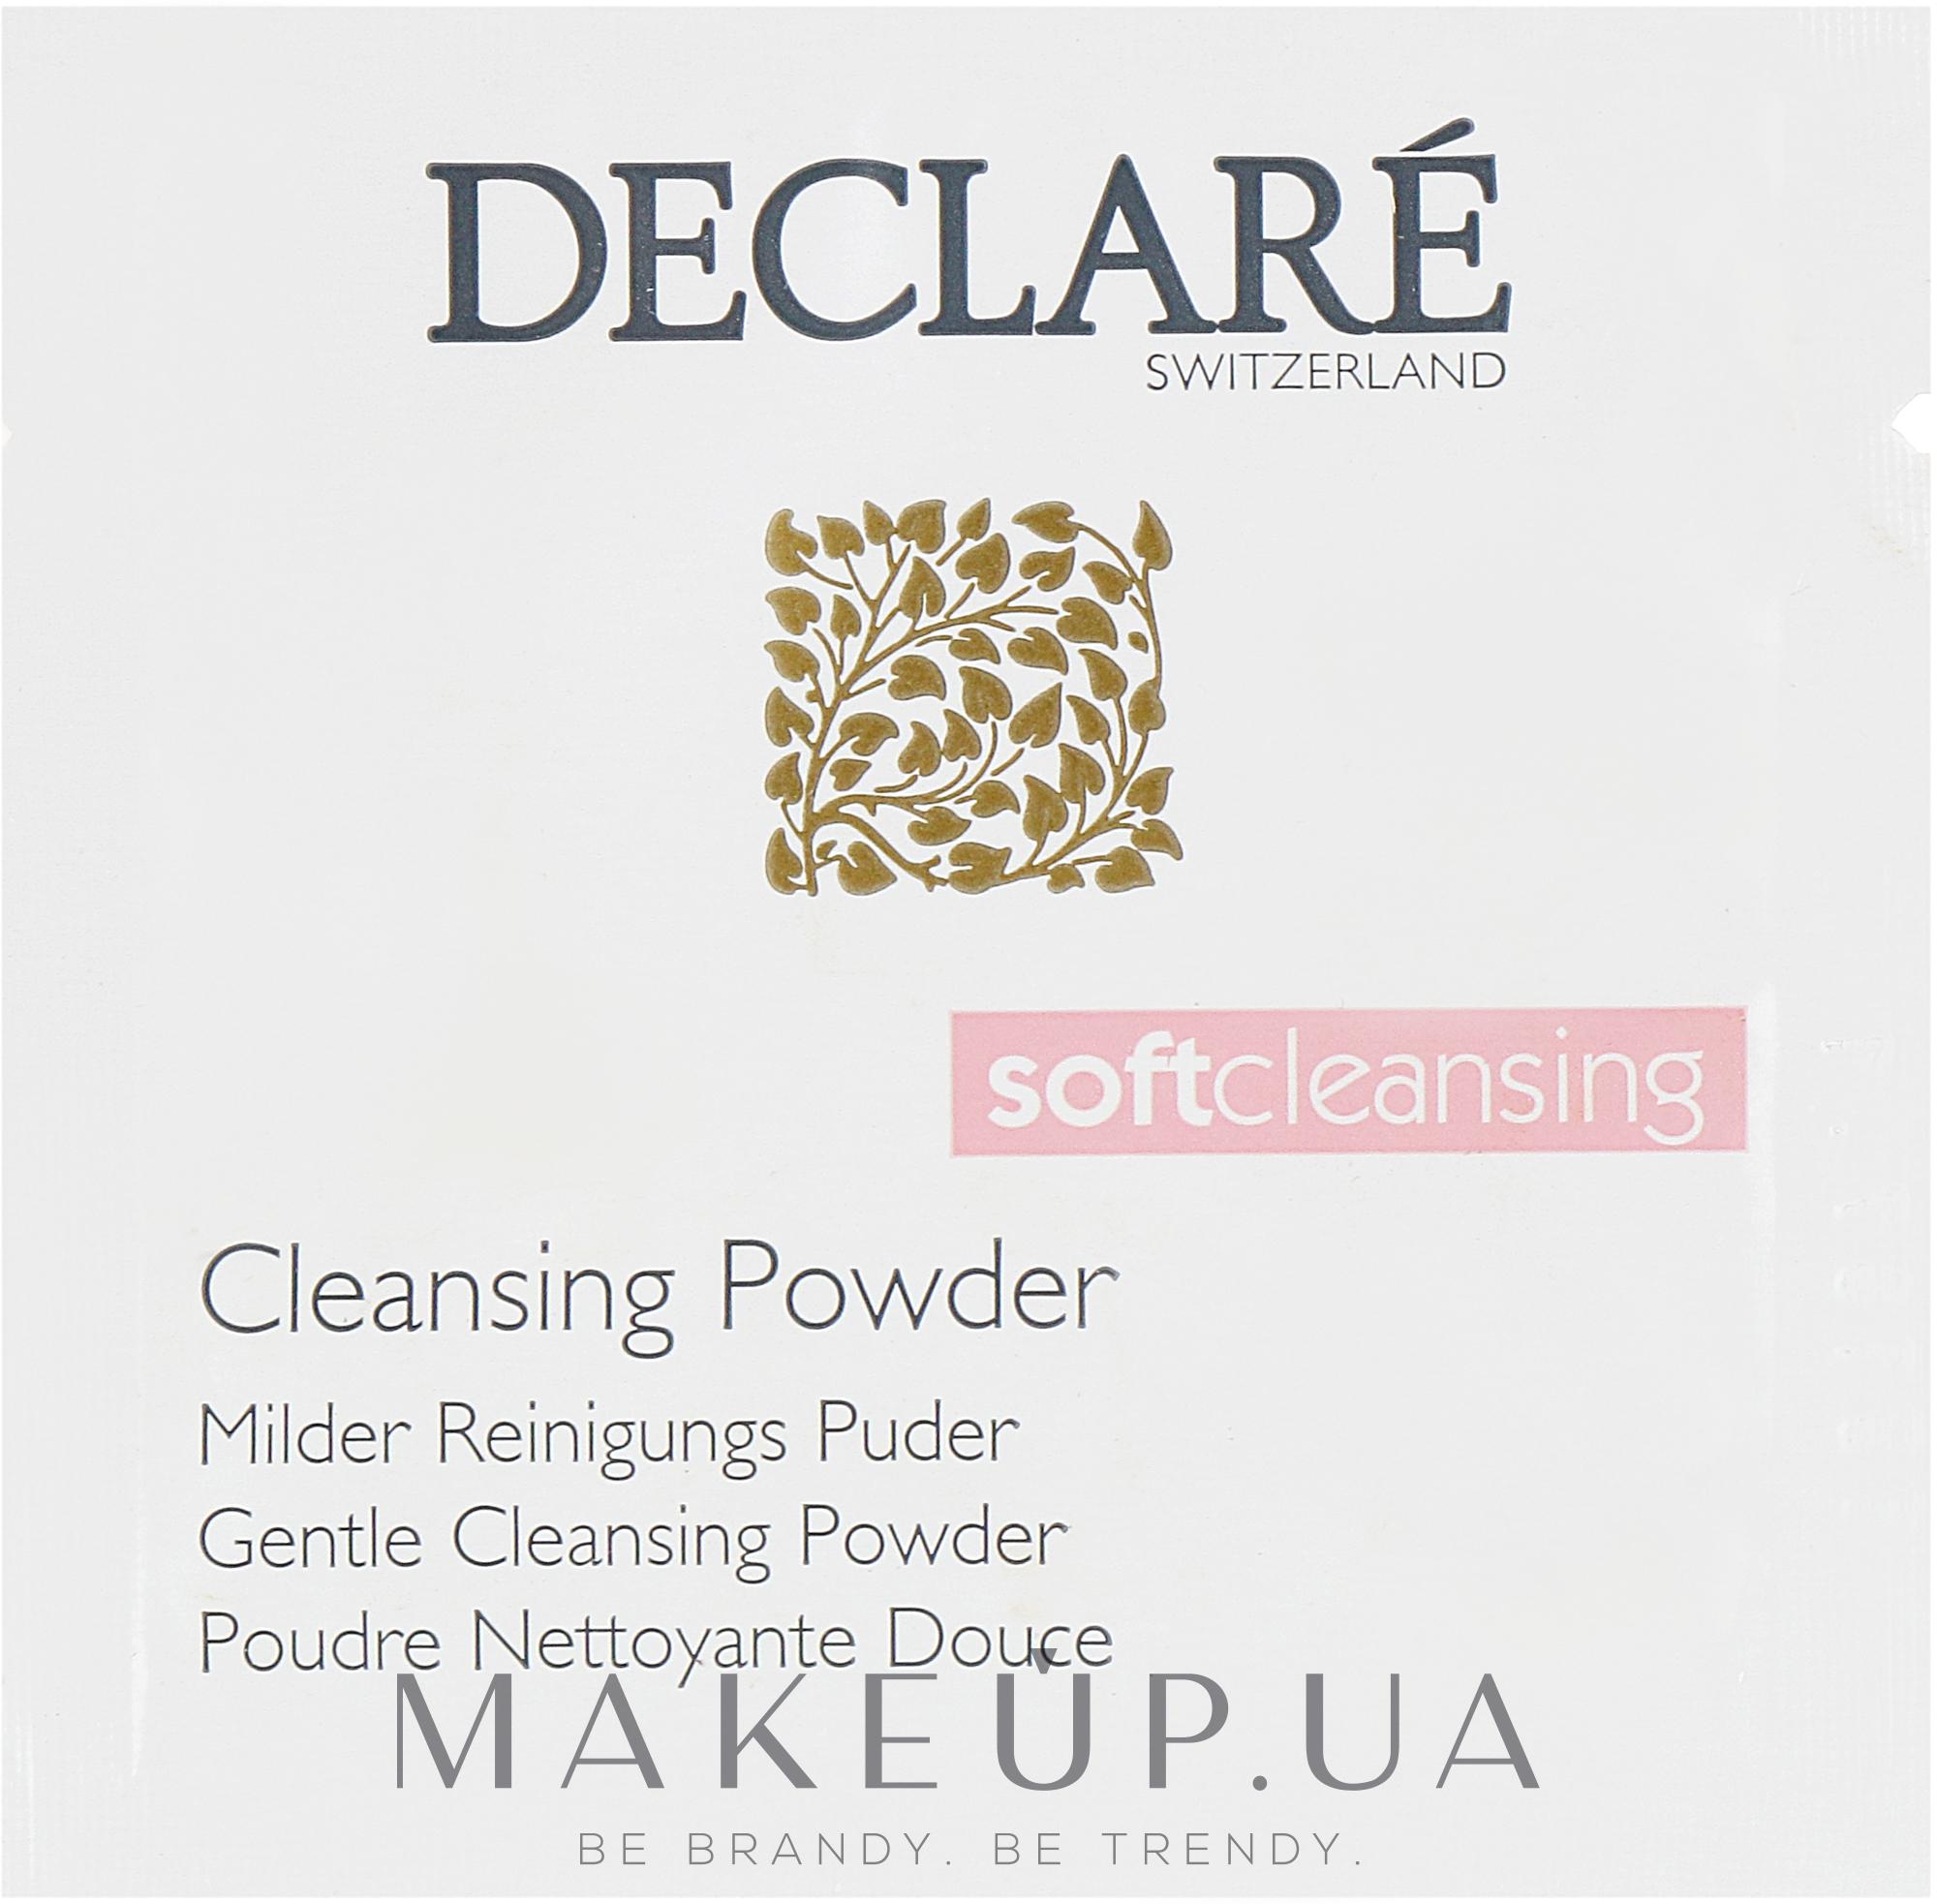 Мягкая очищающая пудра - Declare Gentle Cleansing Powder (пробник) — фото 1g